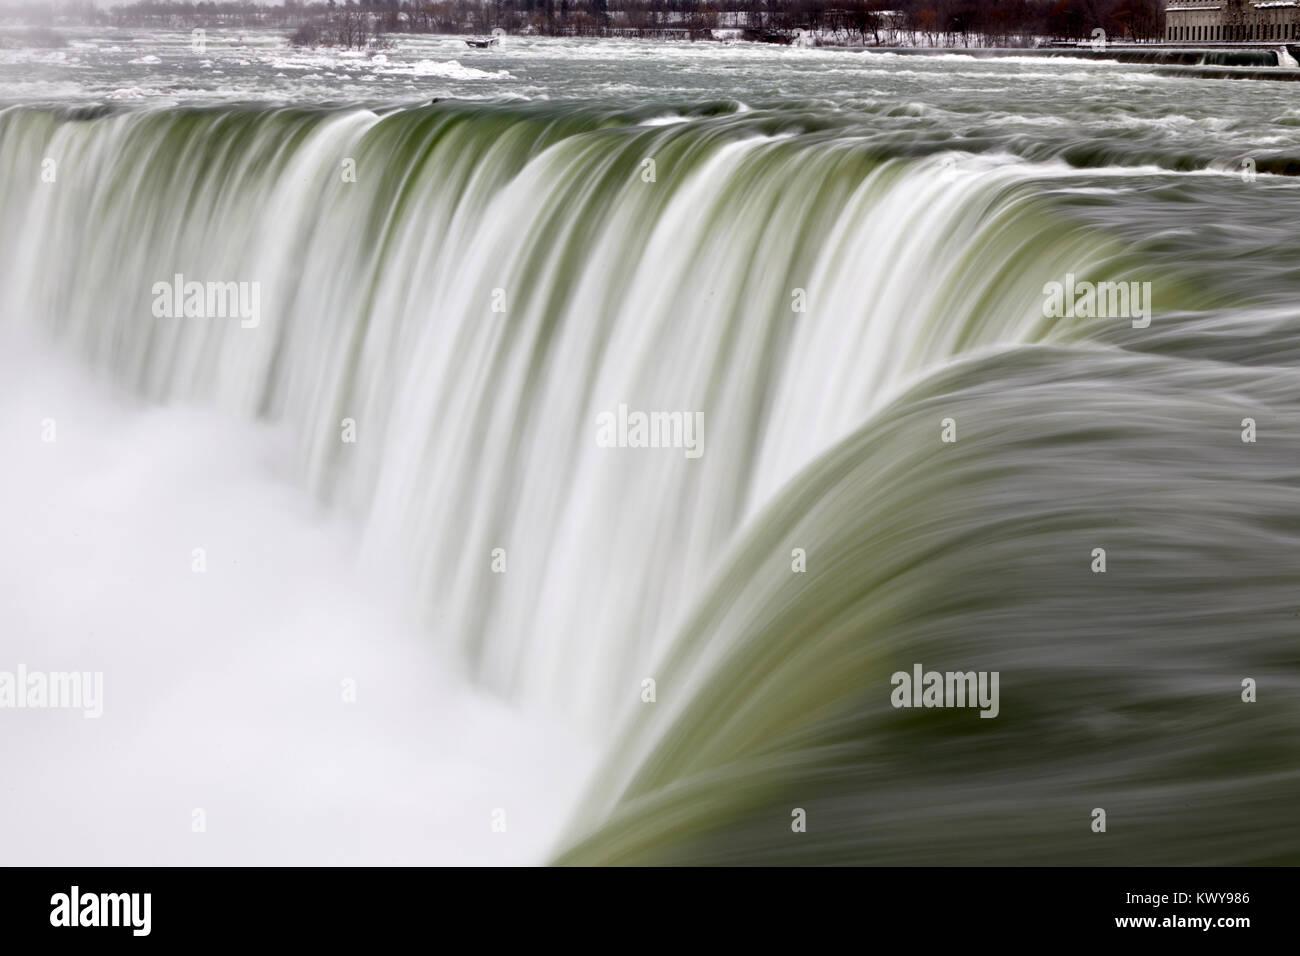 Niagara Falls - Ice Studies Jan 2018 - Stock Image